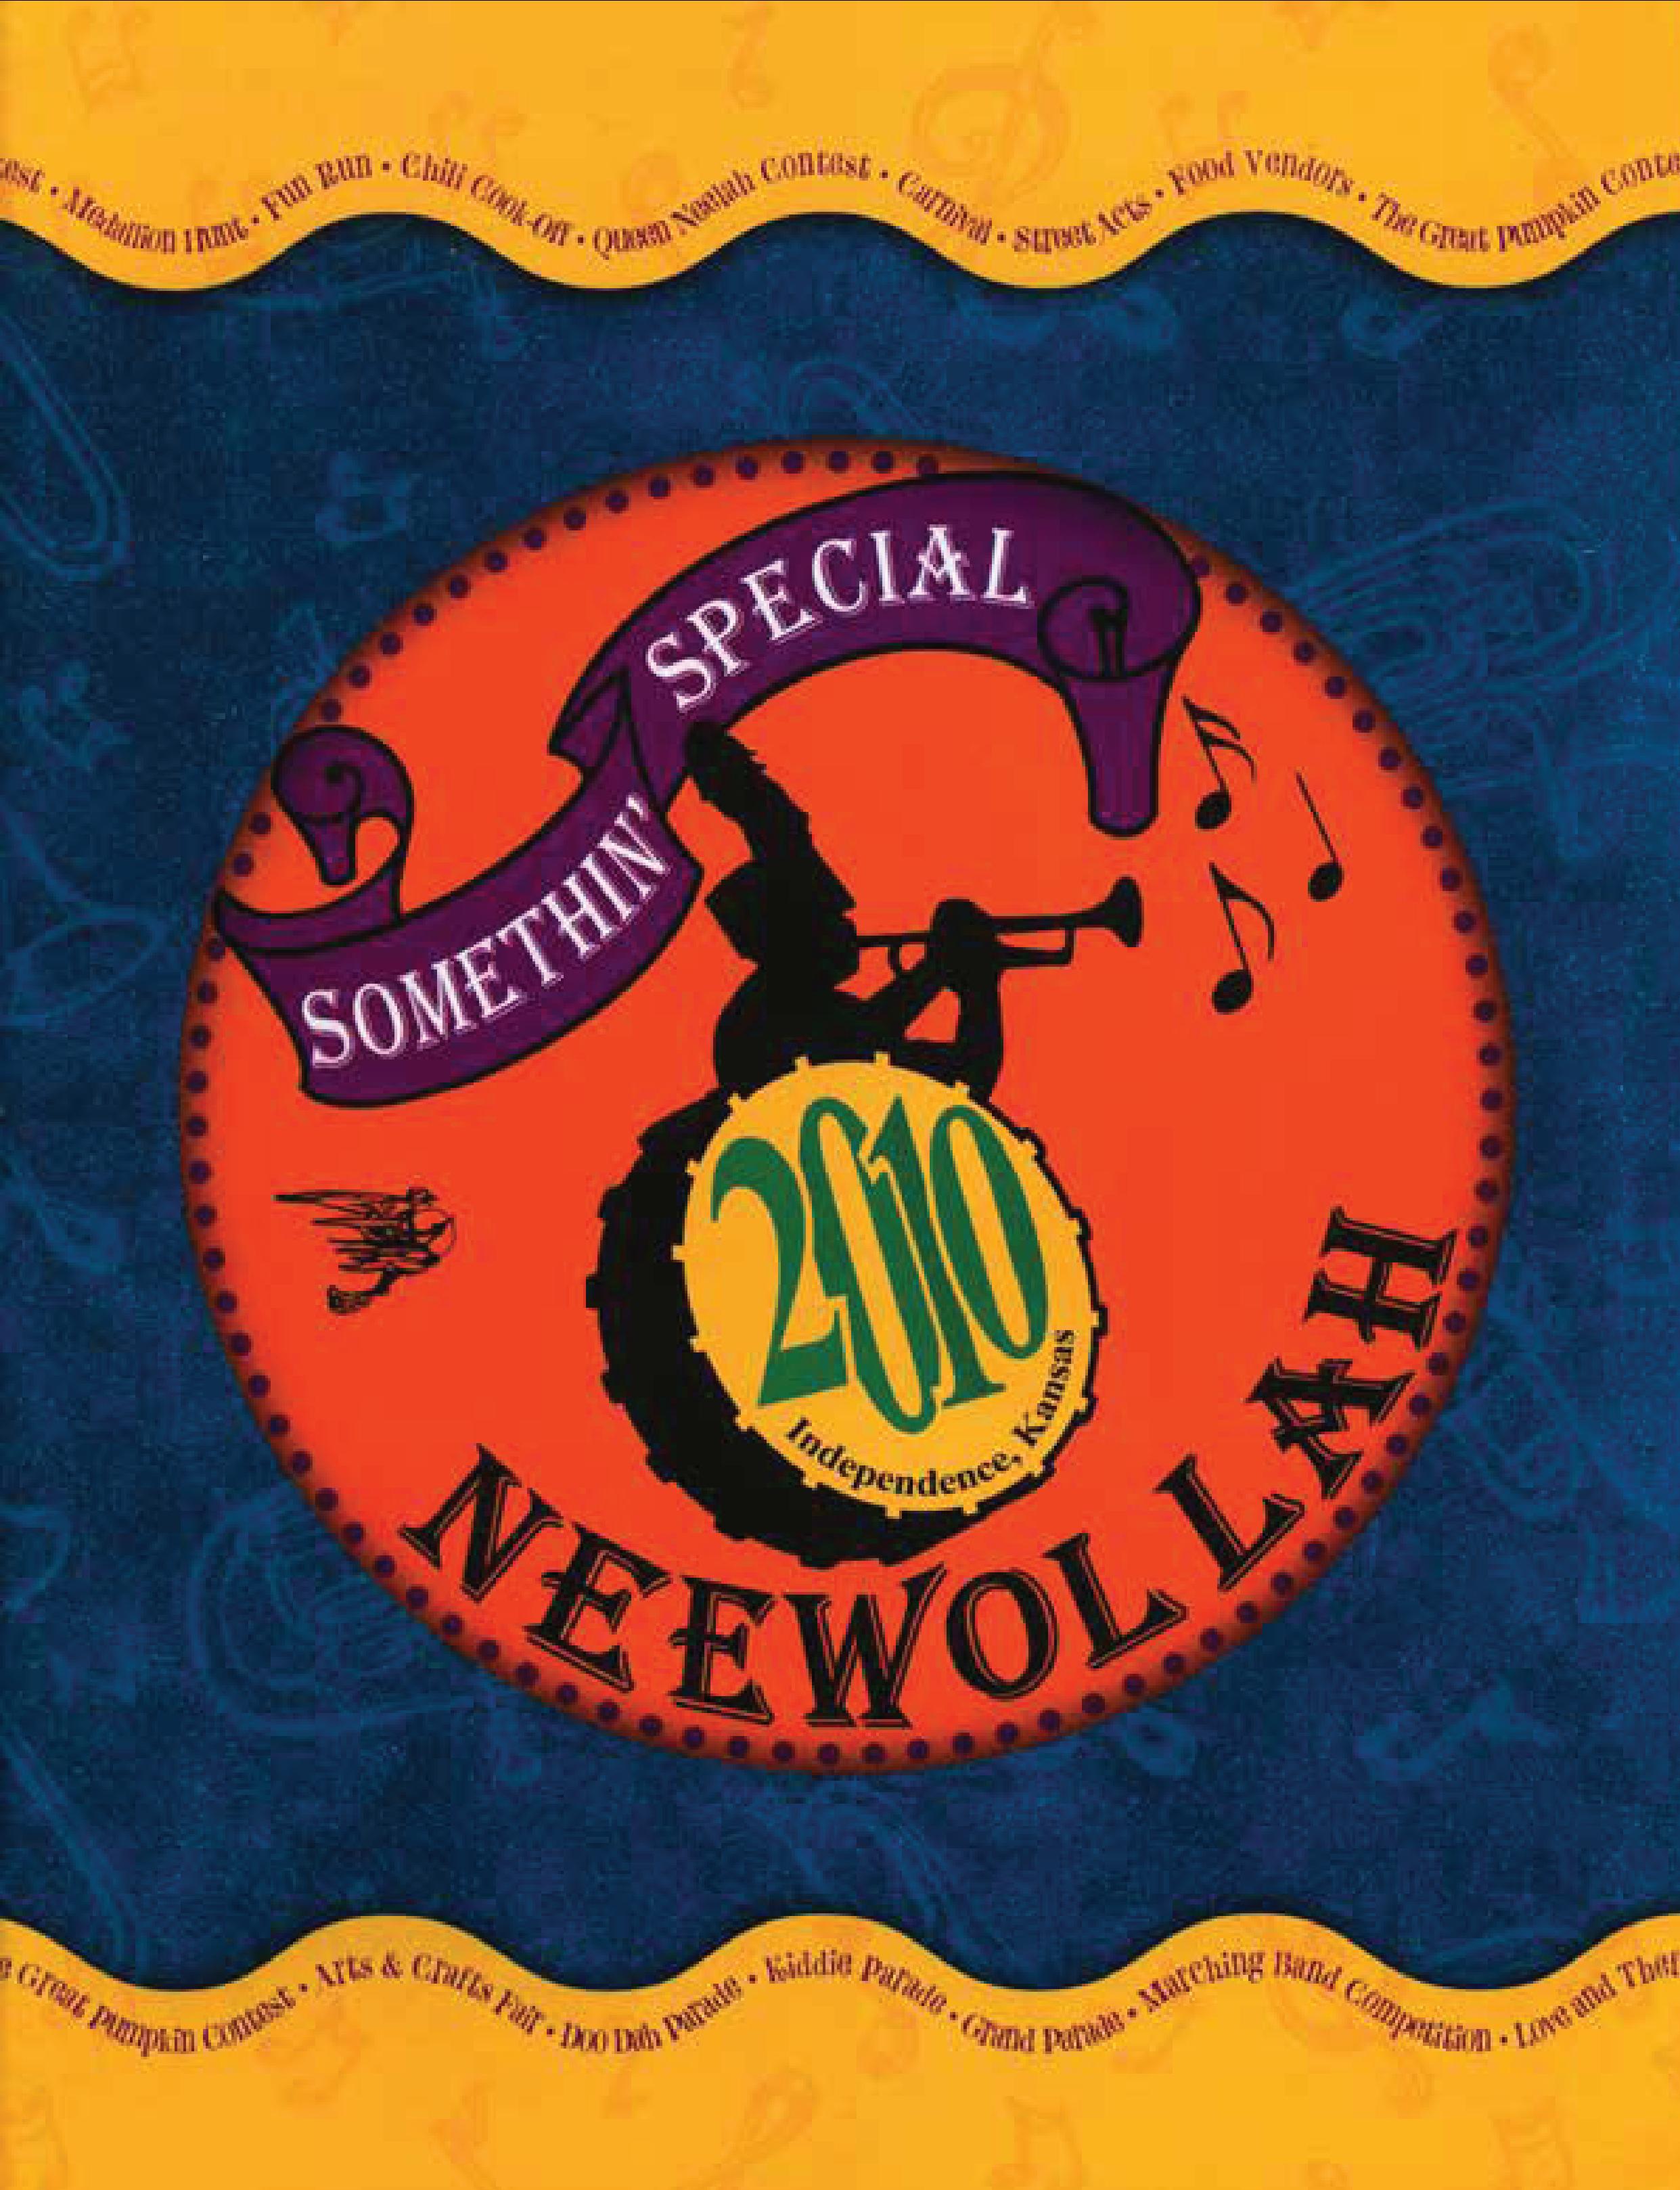 Neewollah 2010 Somethin Special